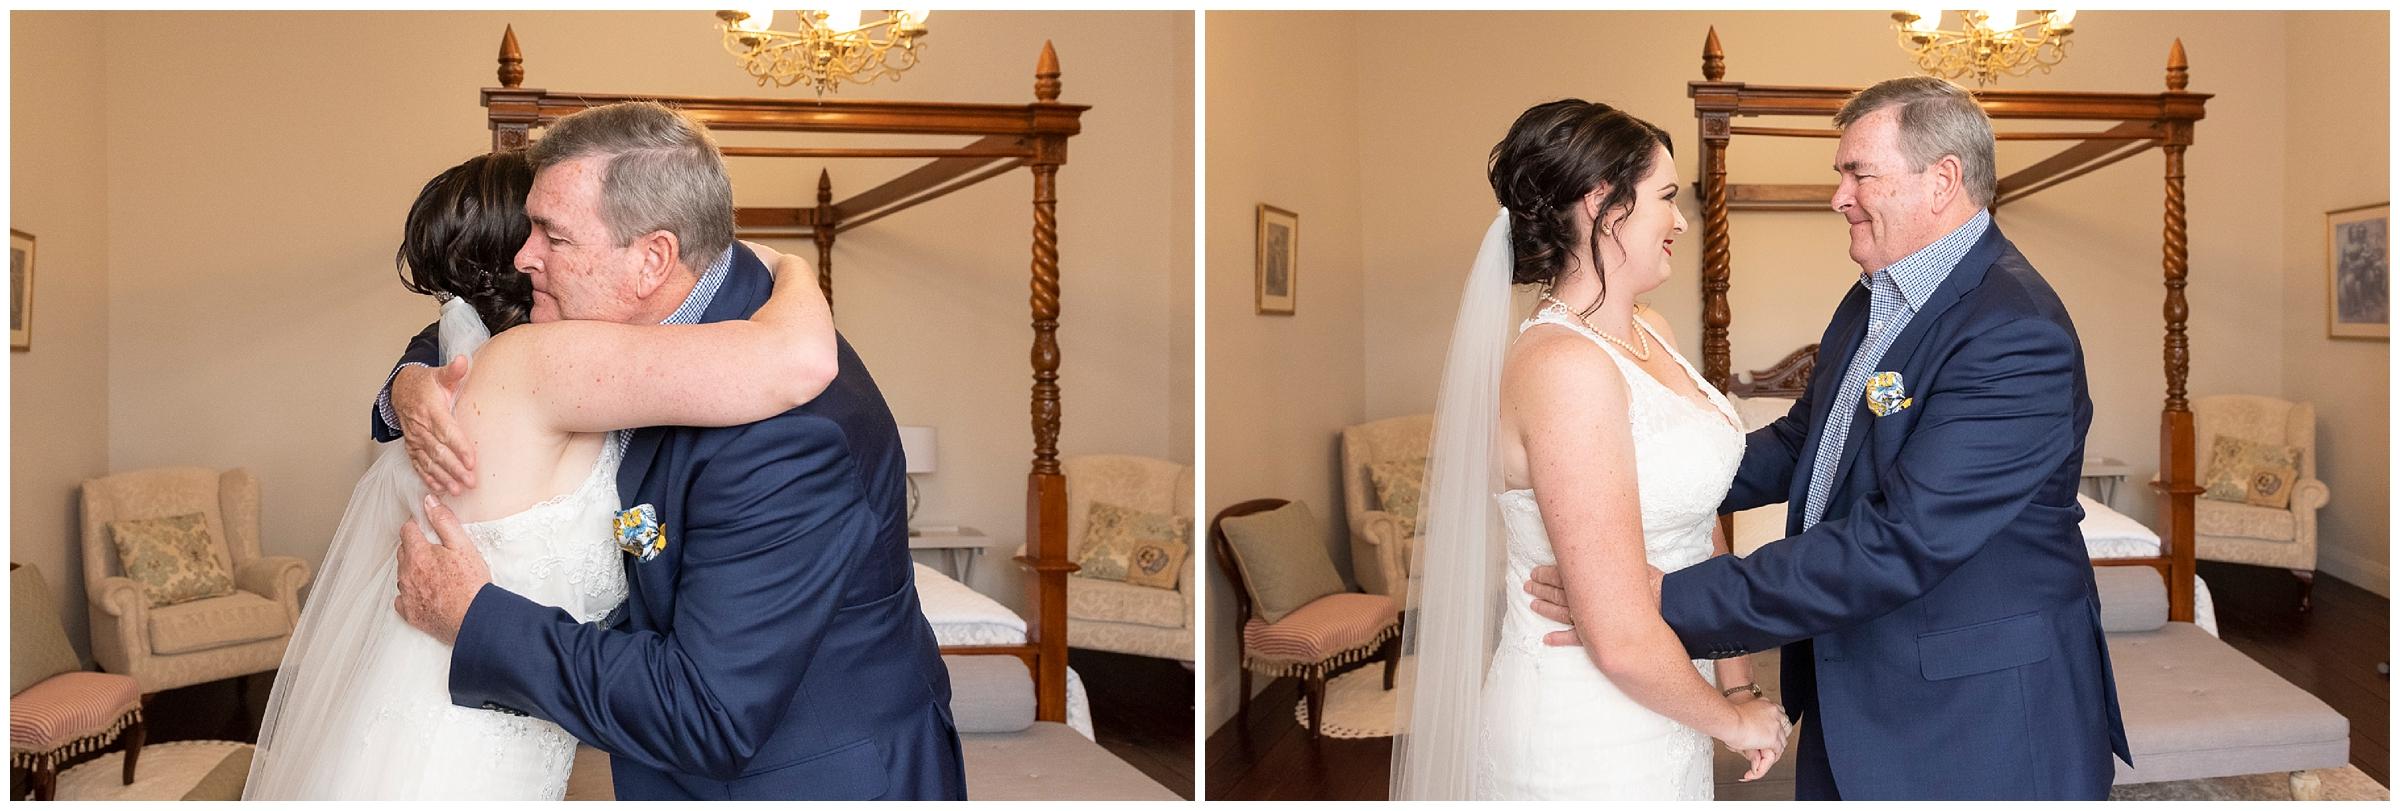 Boyup Brook Wedding Photography_0049.jpg